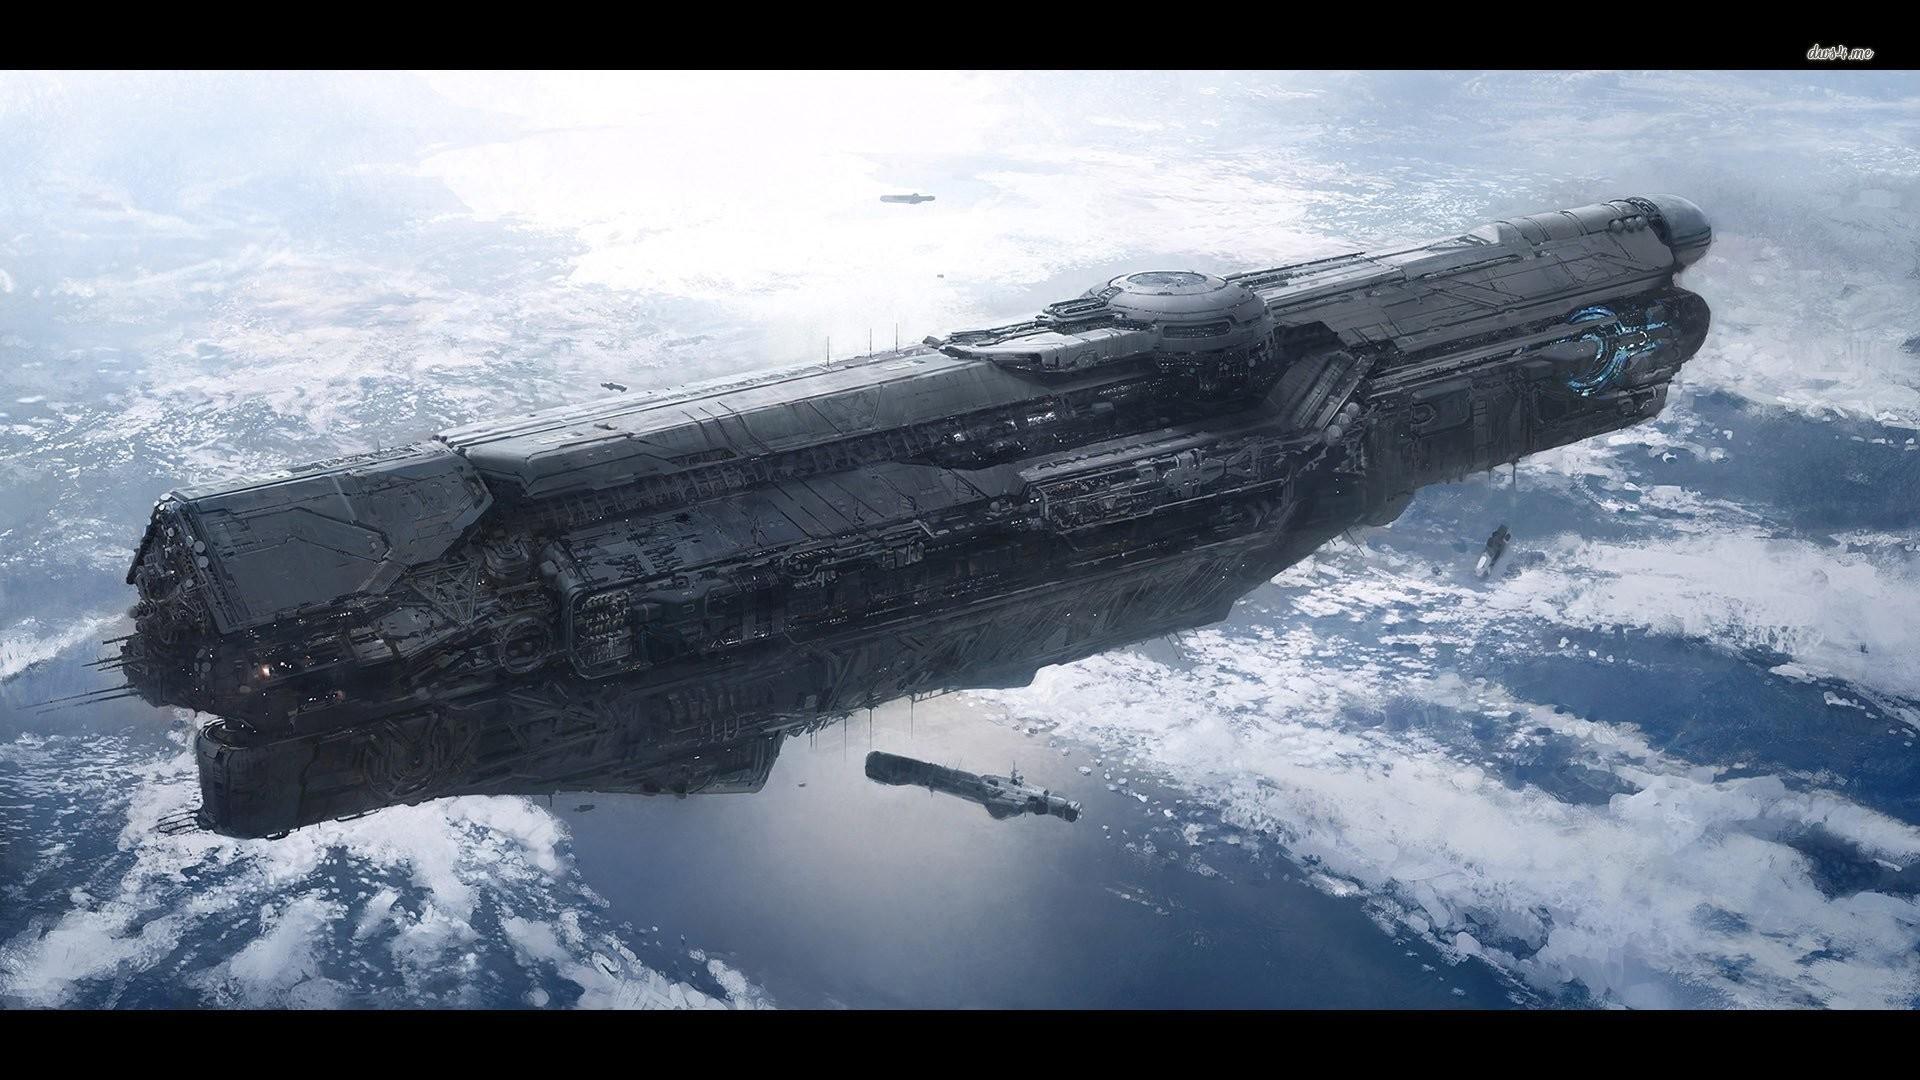 UNSC Infinity – Halo 4